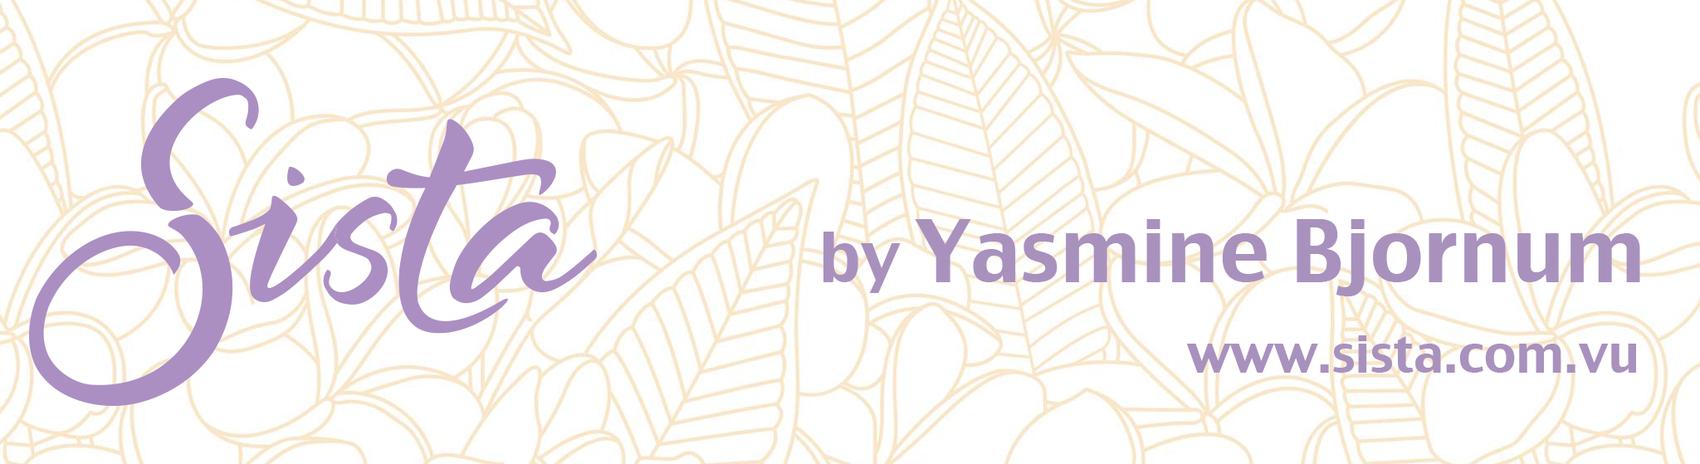 sista-logo-vanuatu-daily-post